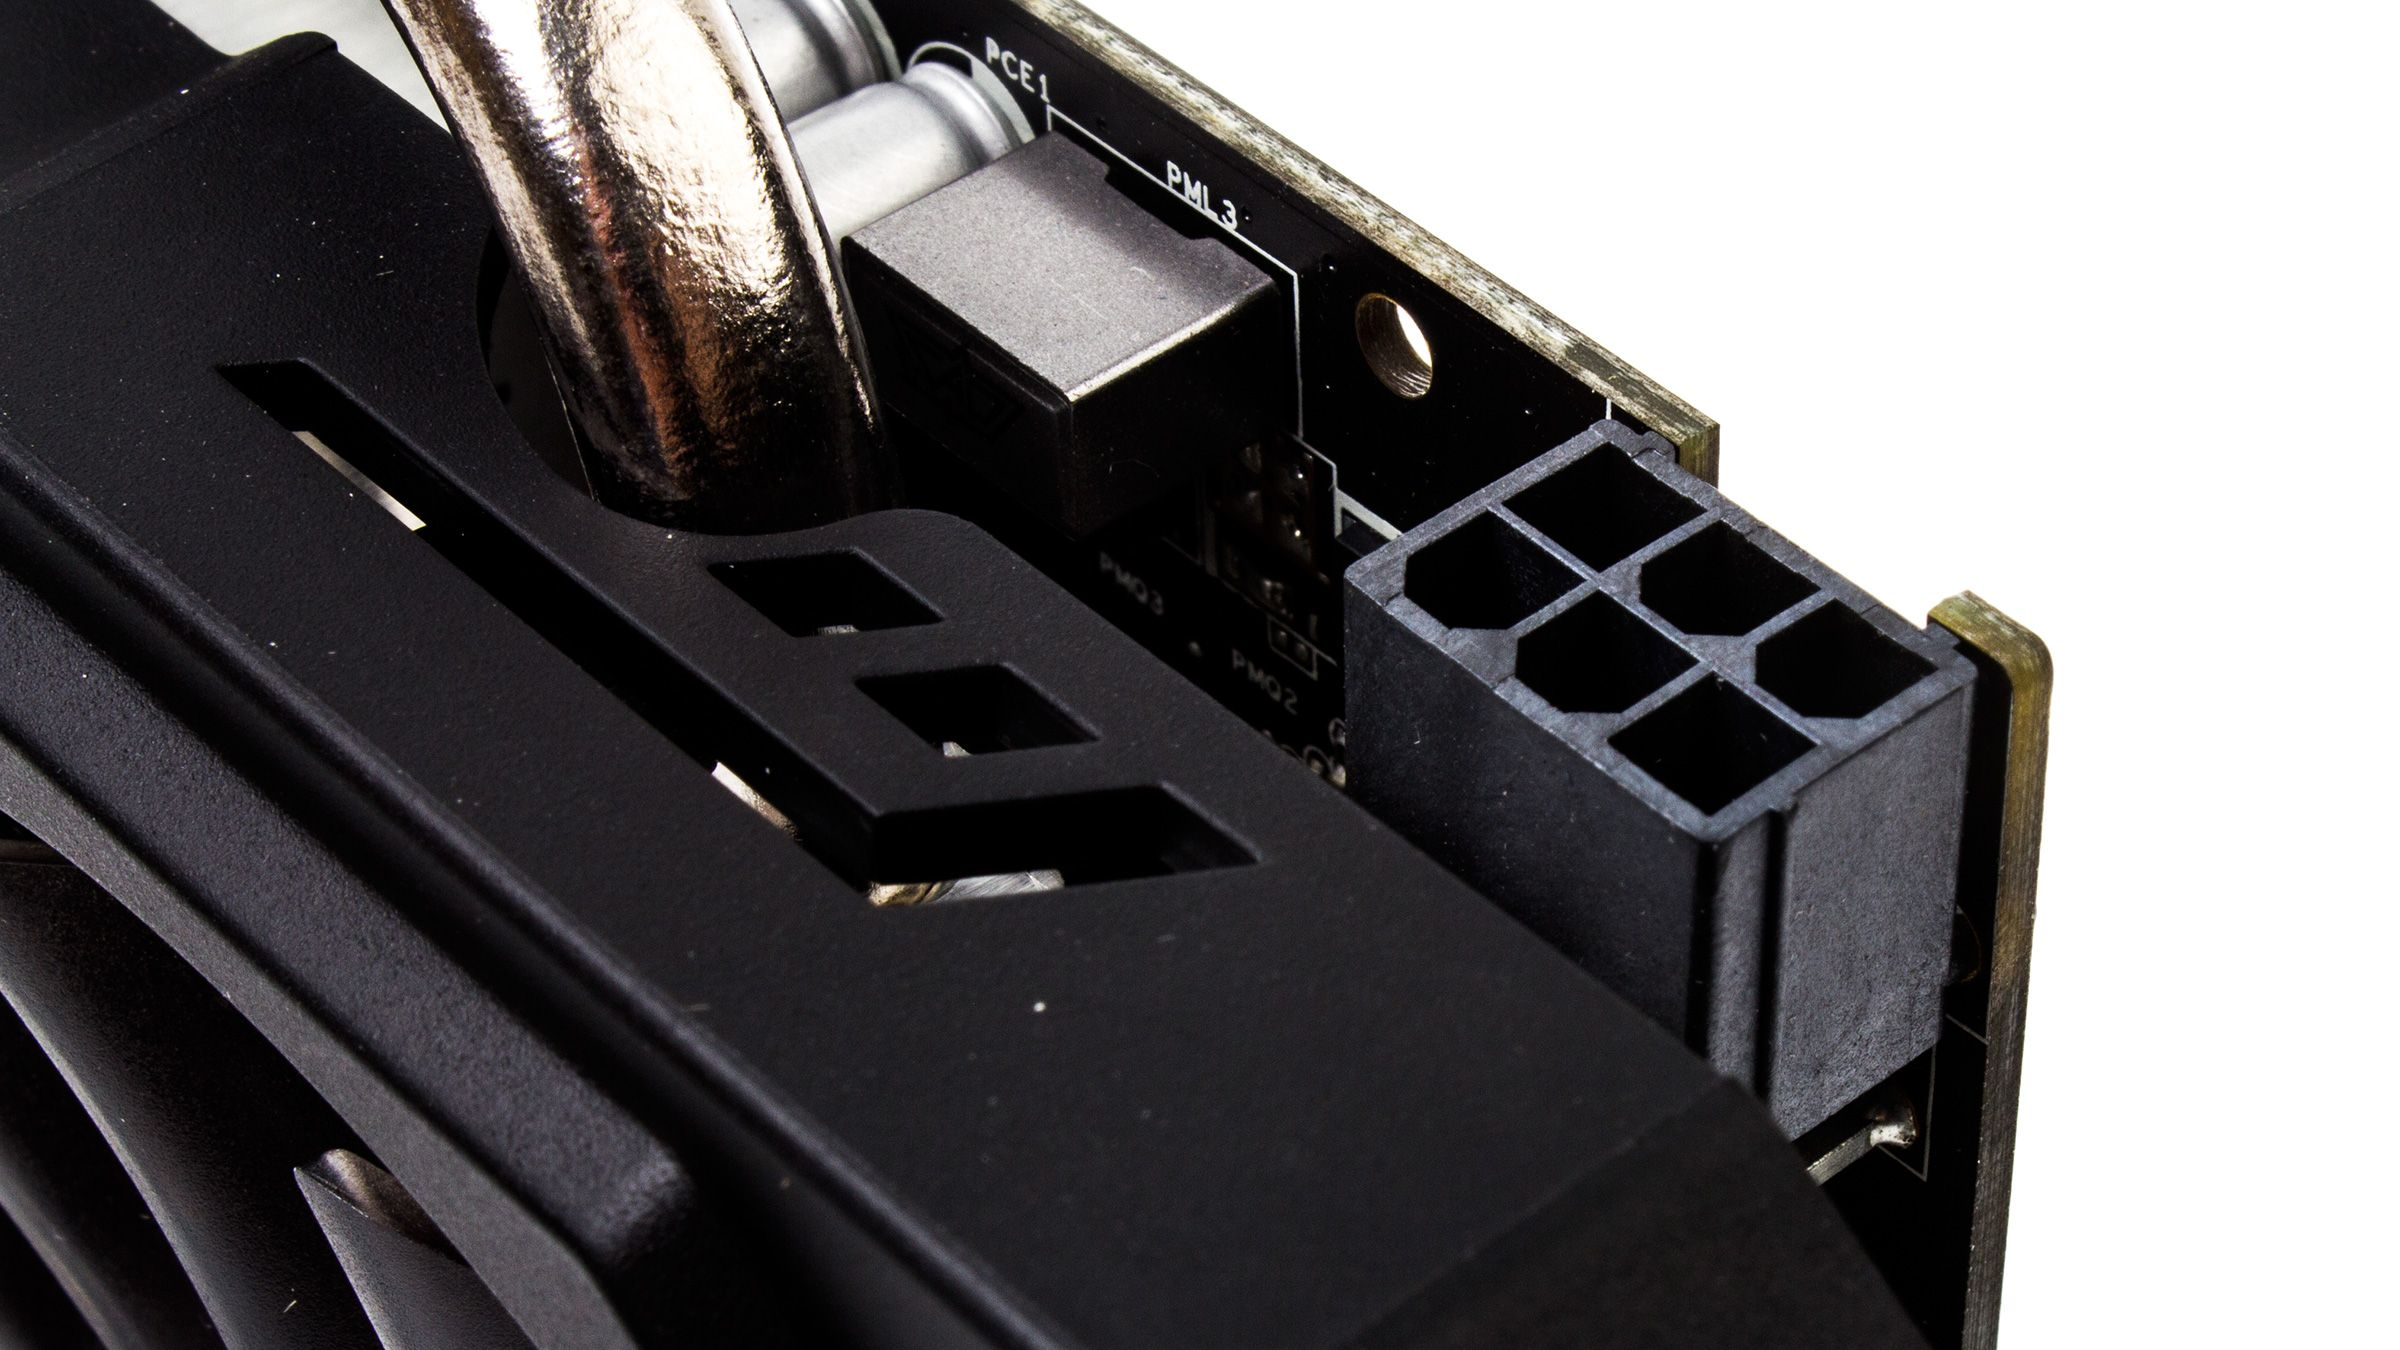 AMD Radeon R9 270 trenger bare en 6-pins strømplugg.Foto: Varg Aamo, Hardware.no